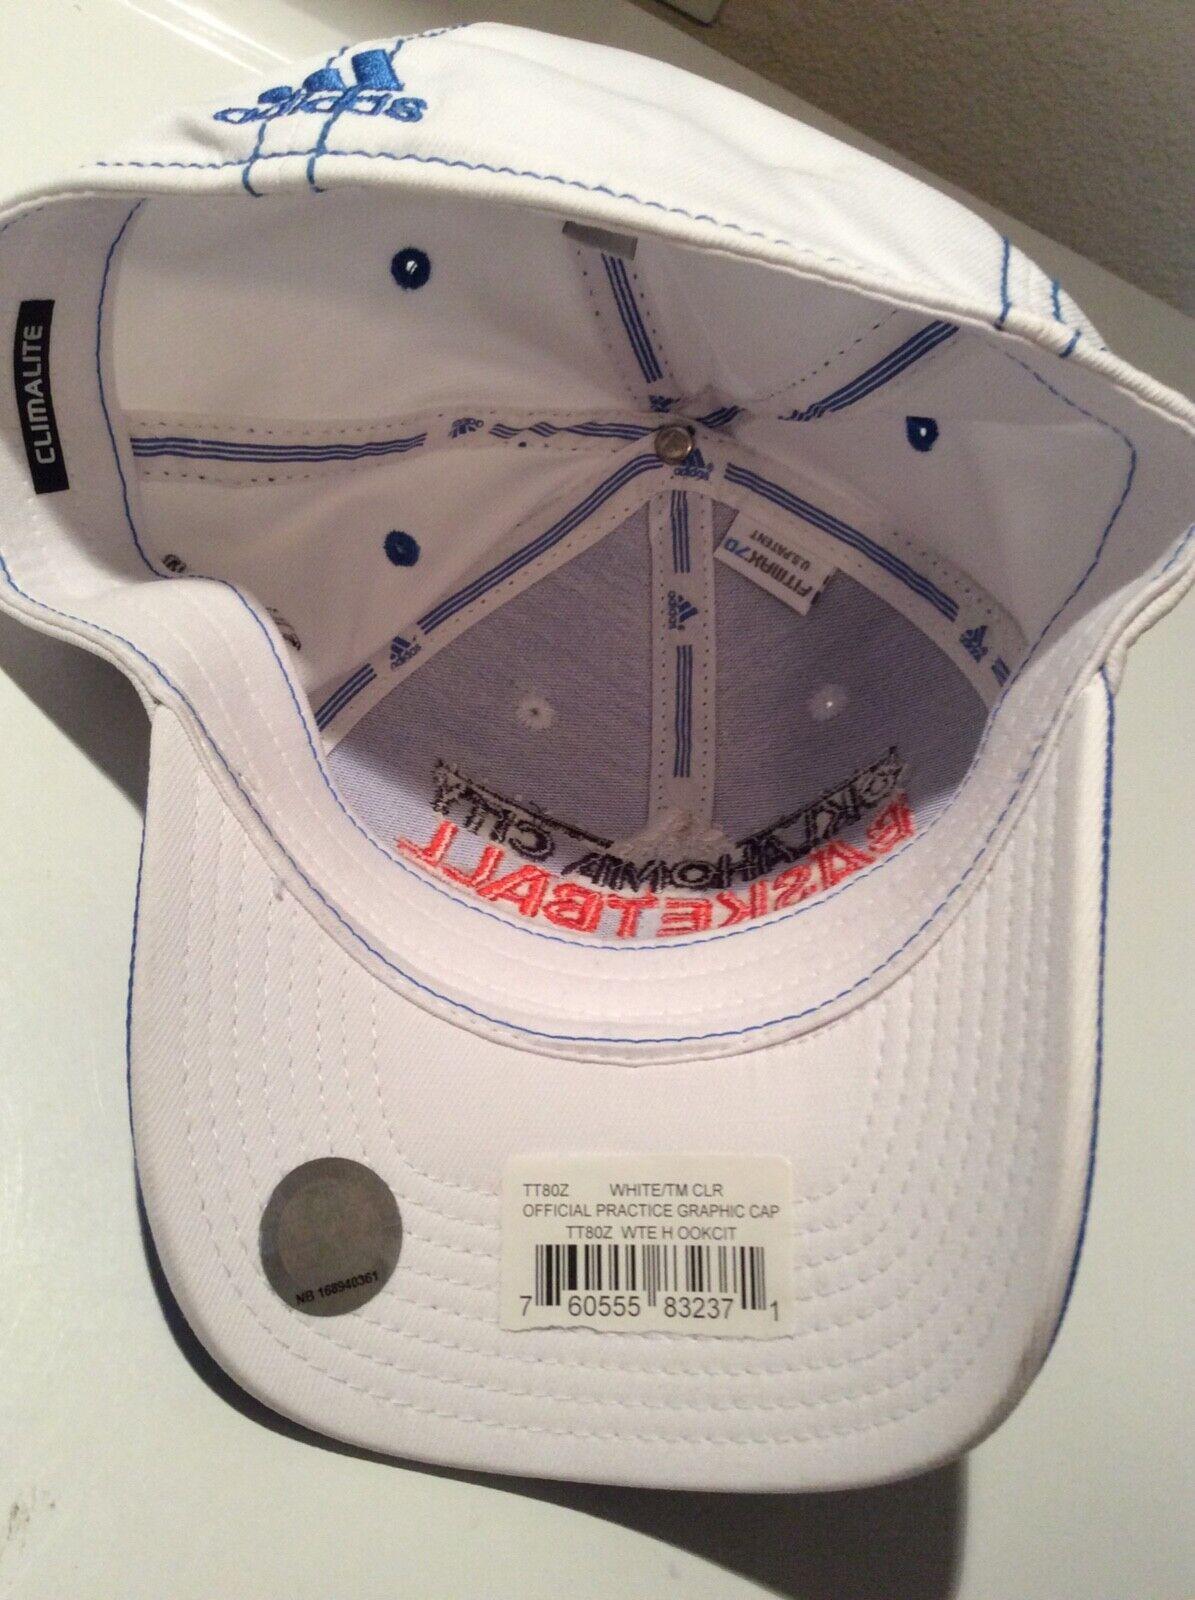 Oklahoma City Thunder Adidas NBA Adjustable Hats L/XL New W/ Tags - $17.95